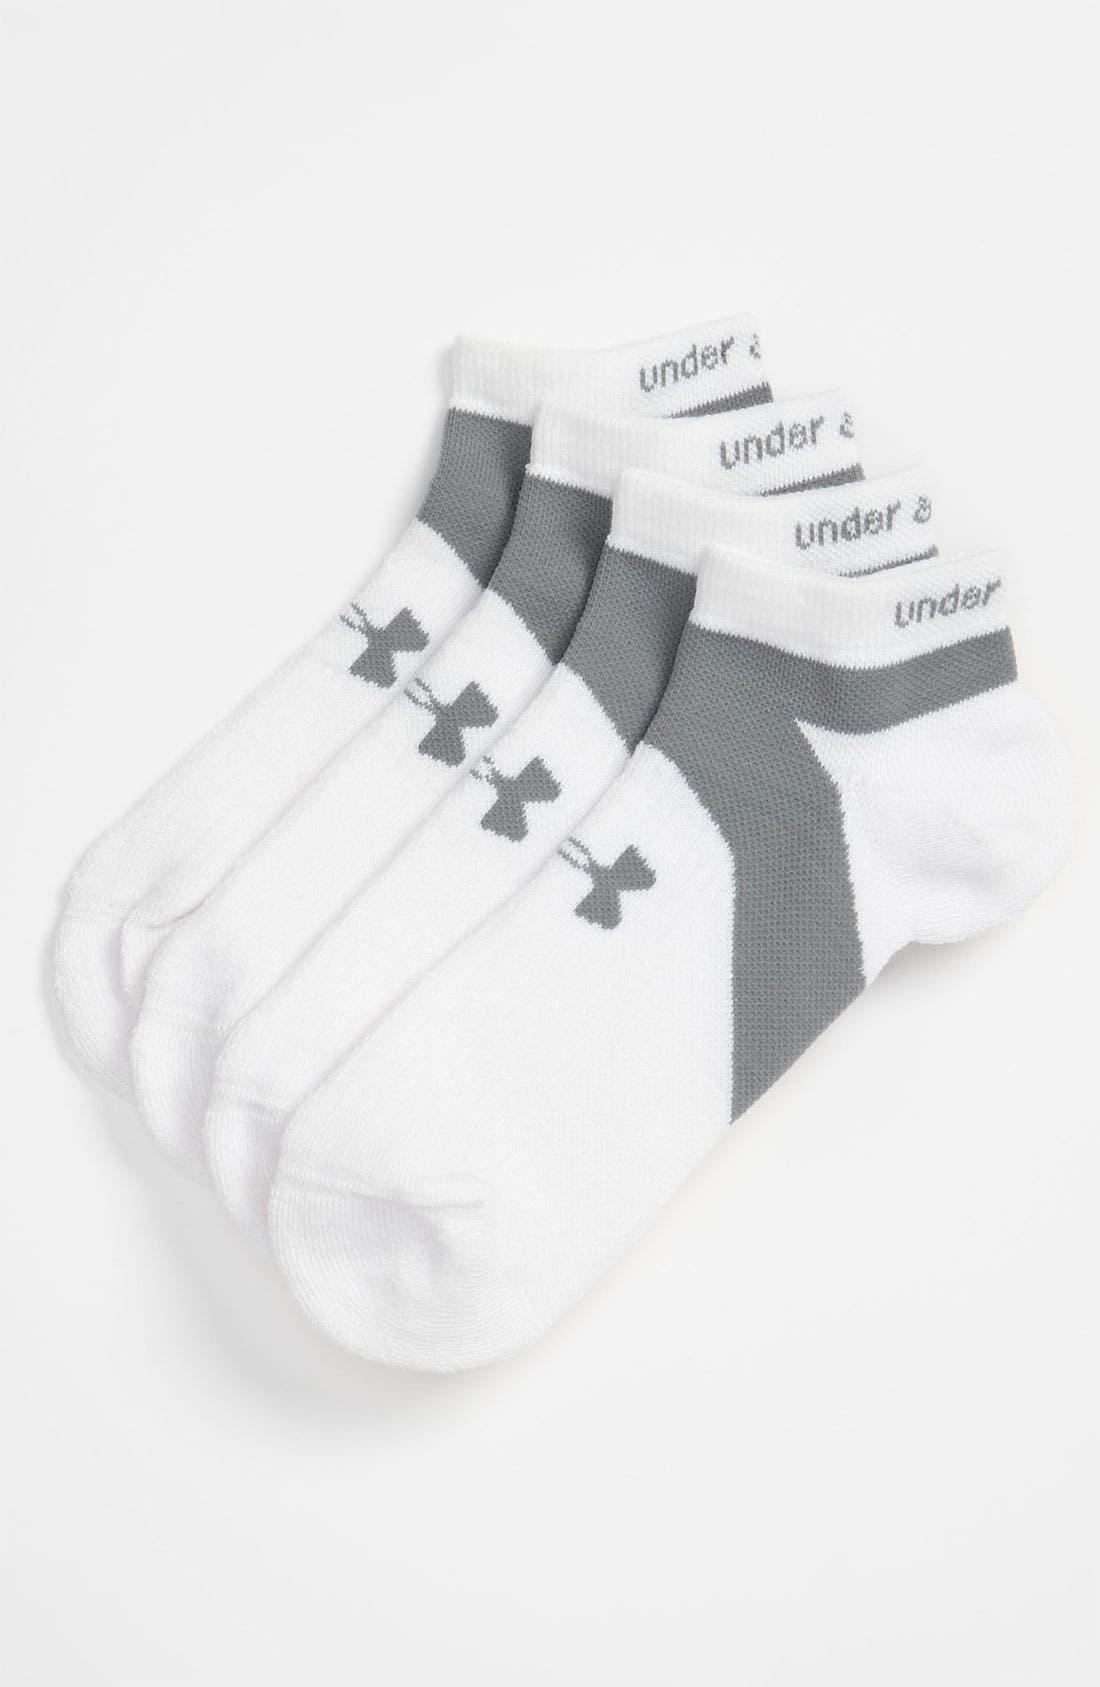 Main Image - Under Armour 'Streamline' Running Socks (2-Pack)